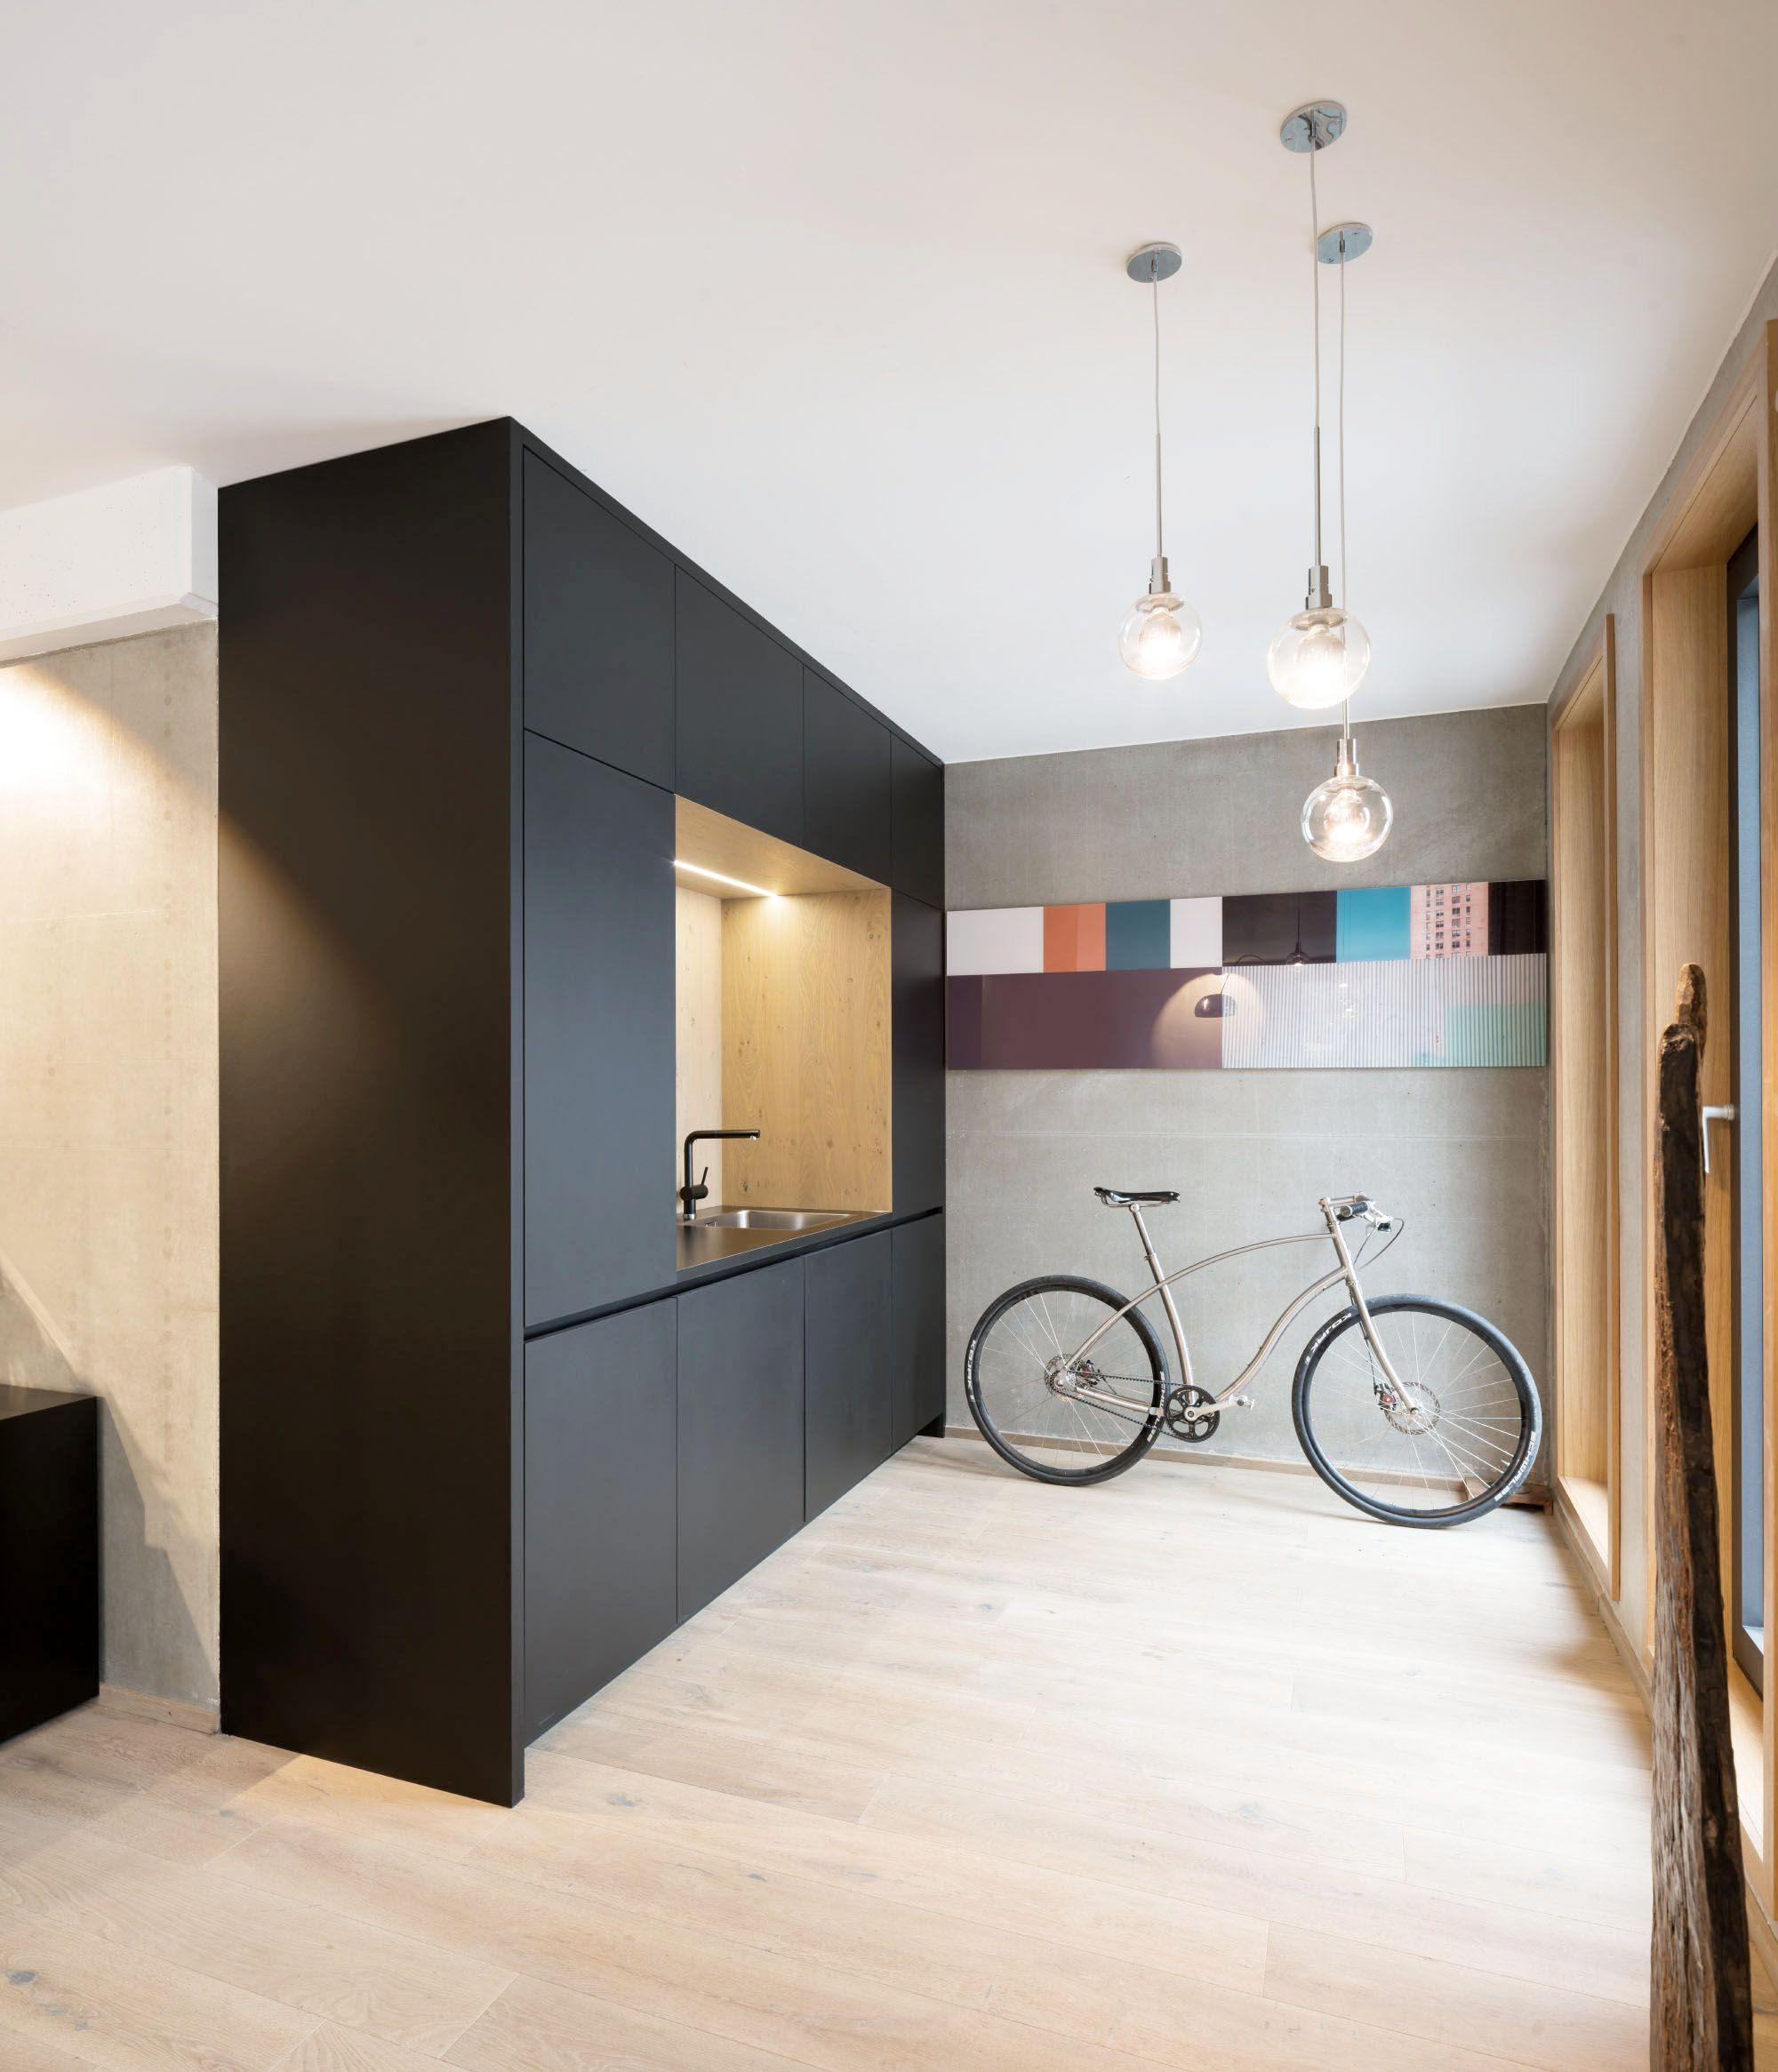 Minimalist Kitchen Design For Small Space: Minimalist Design, Small And Space-saving Kitchen In Black